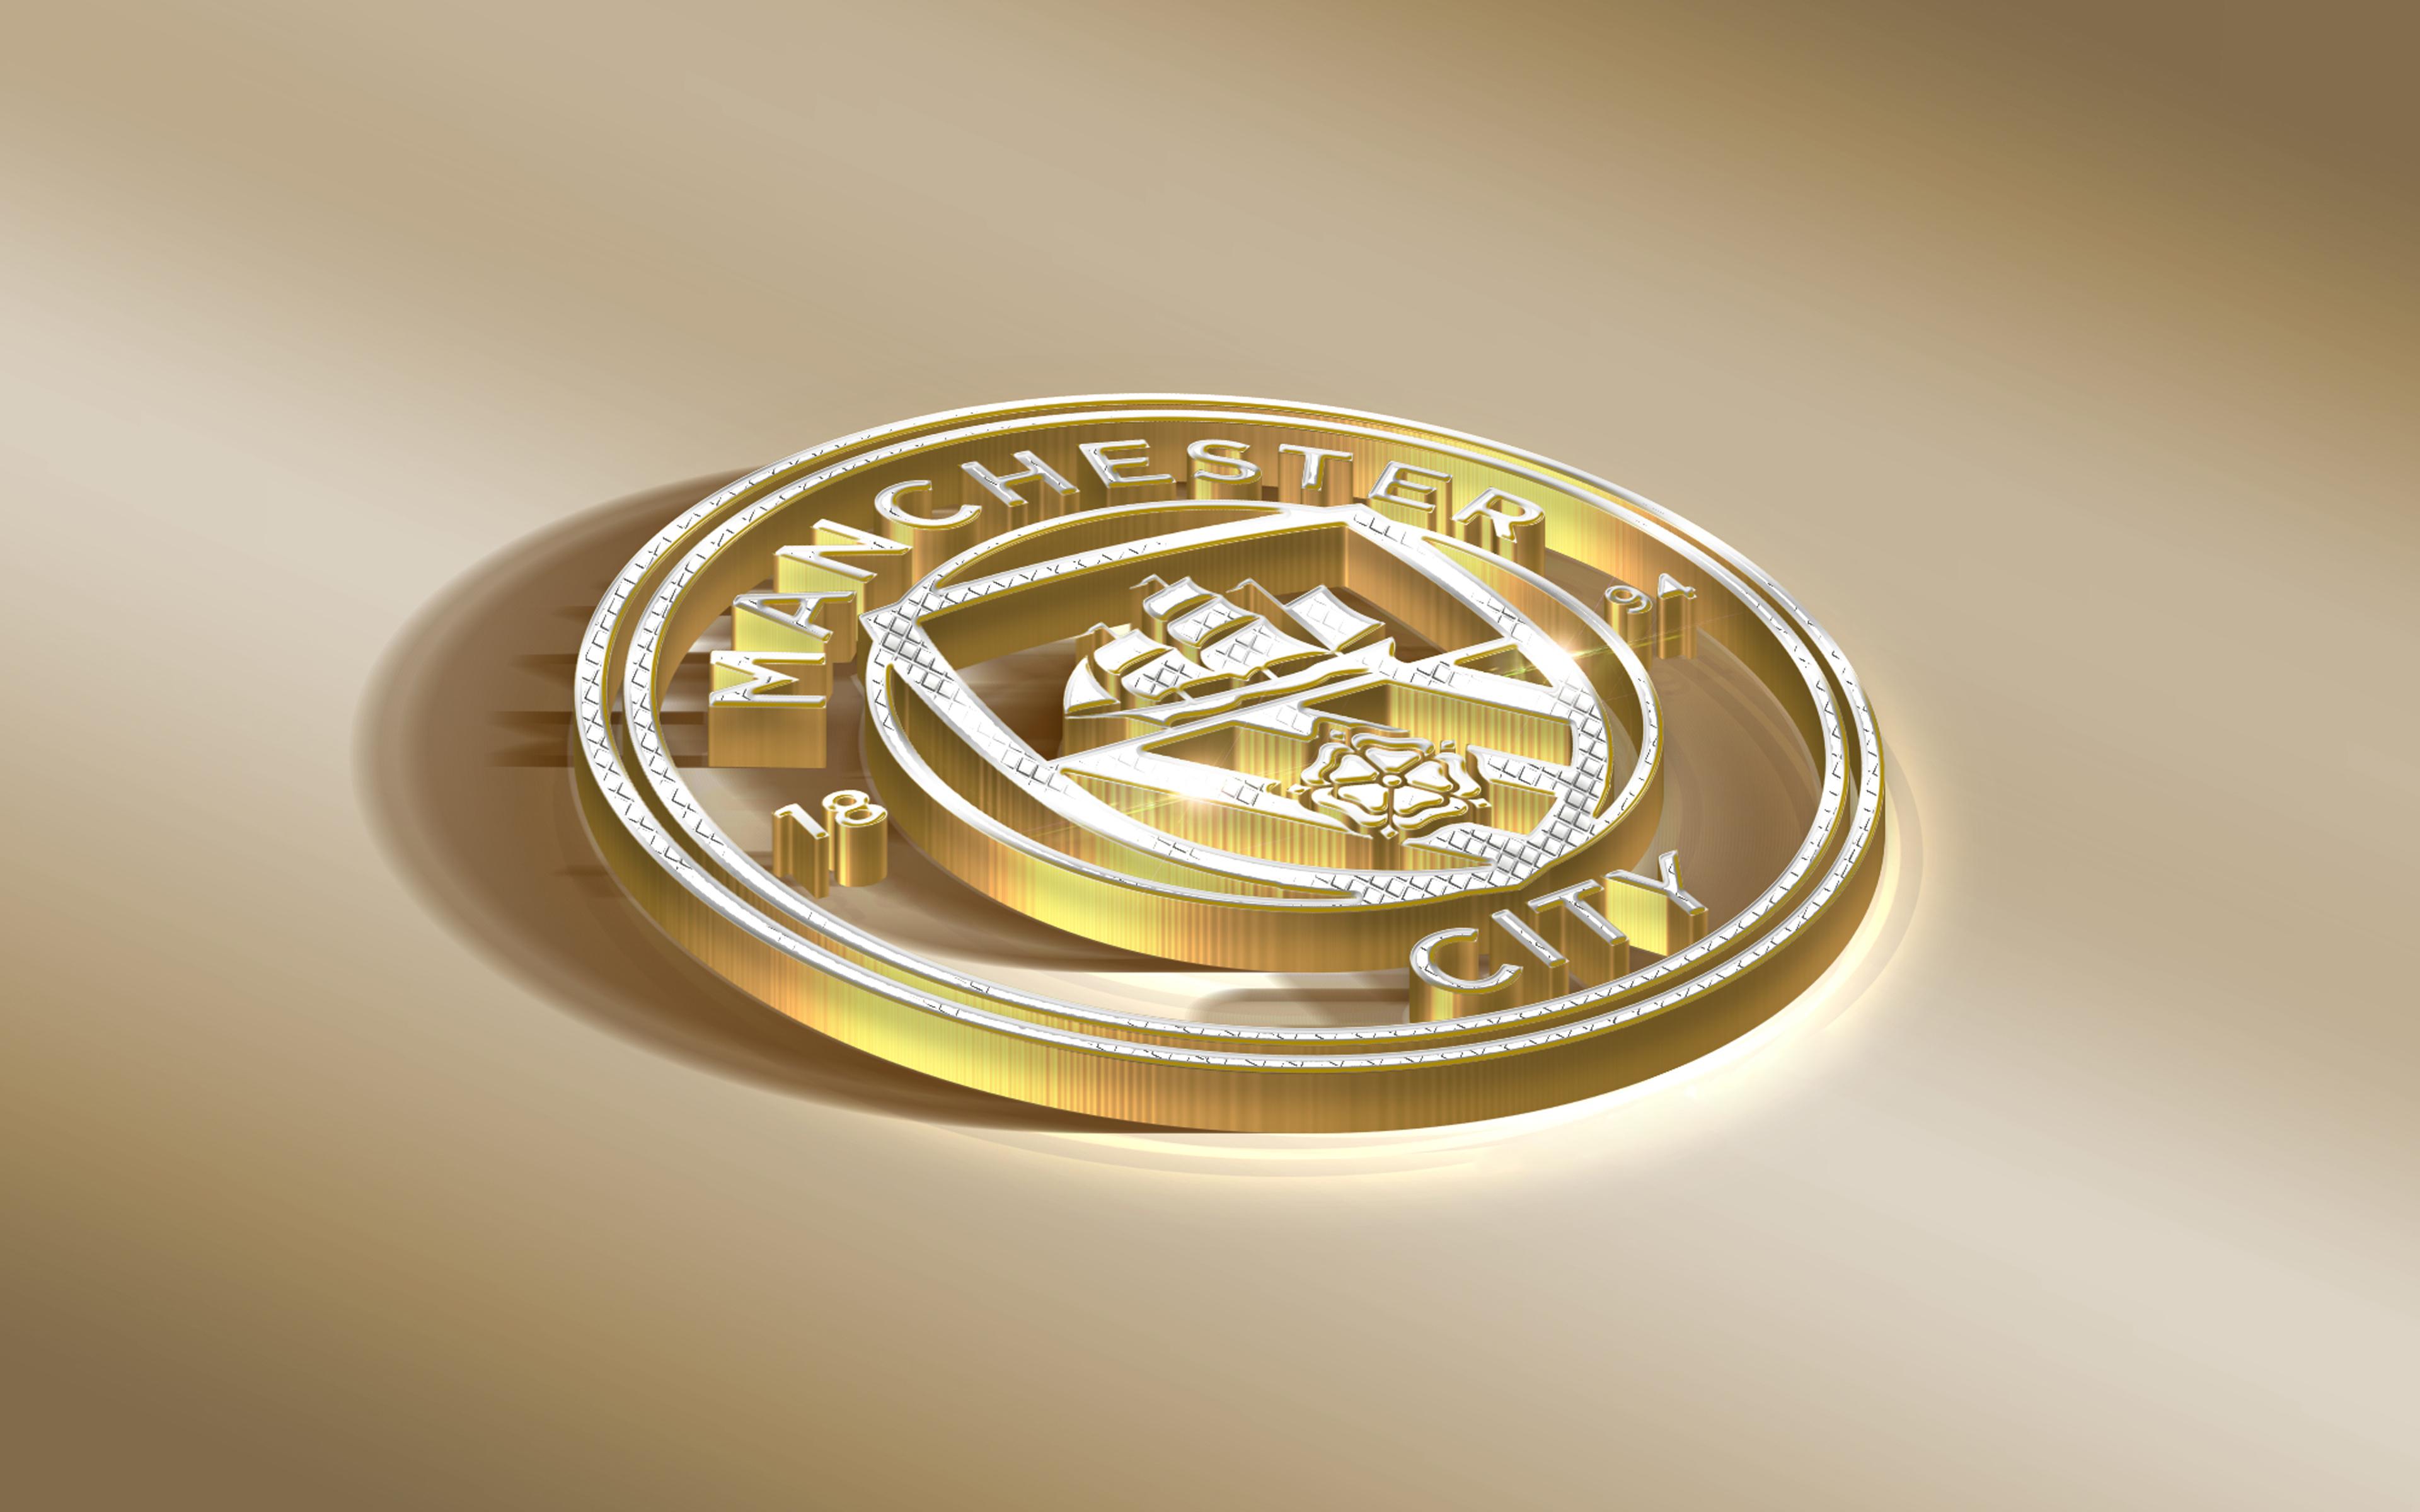 Manchester City F.C. 4k Ultra HD Wallpaper | Background ...